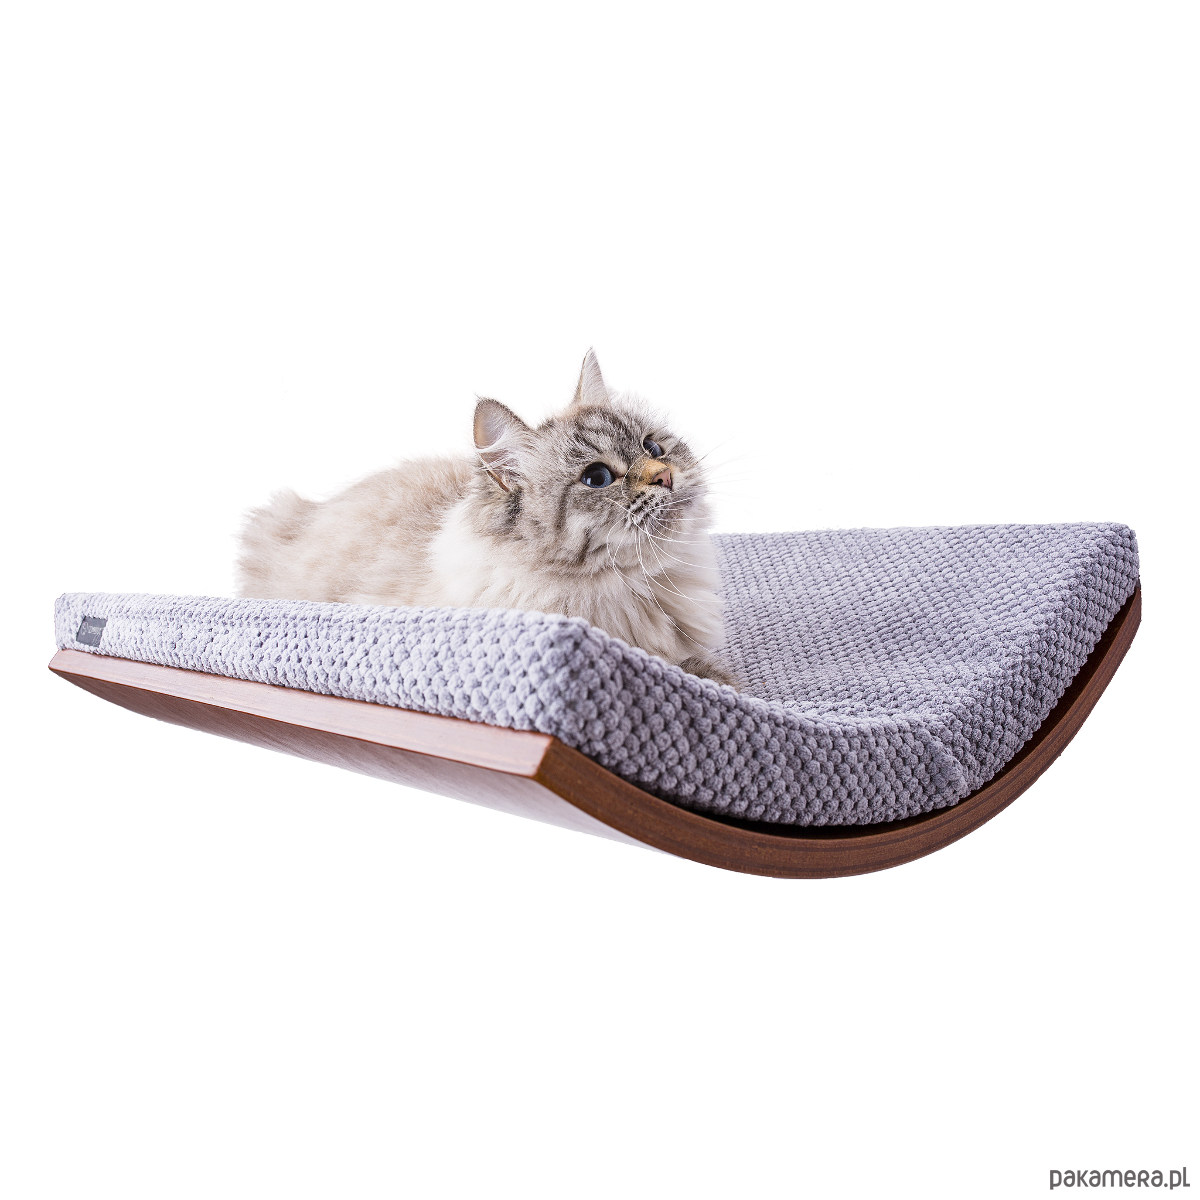 meble dla kot243w legowisko dla kota p243�ka kot dla